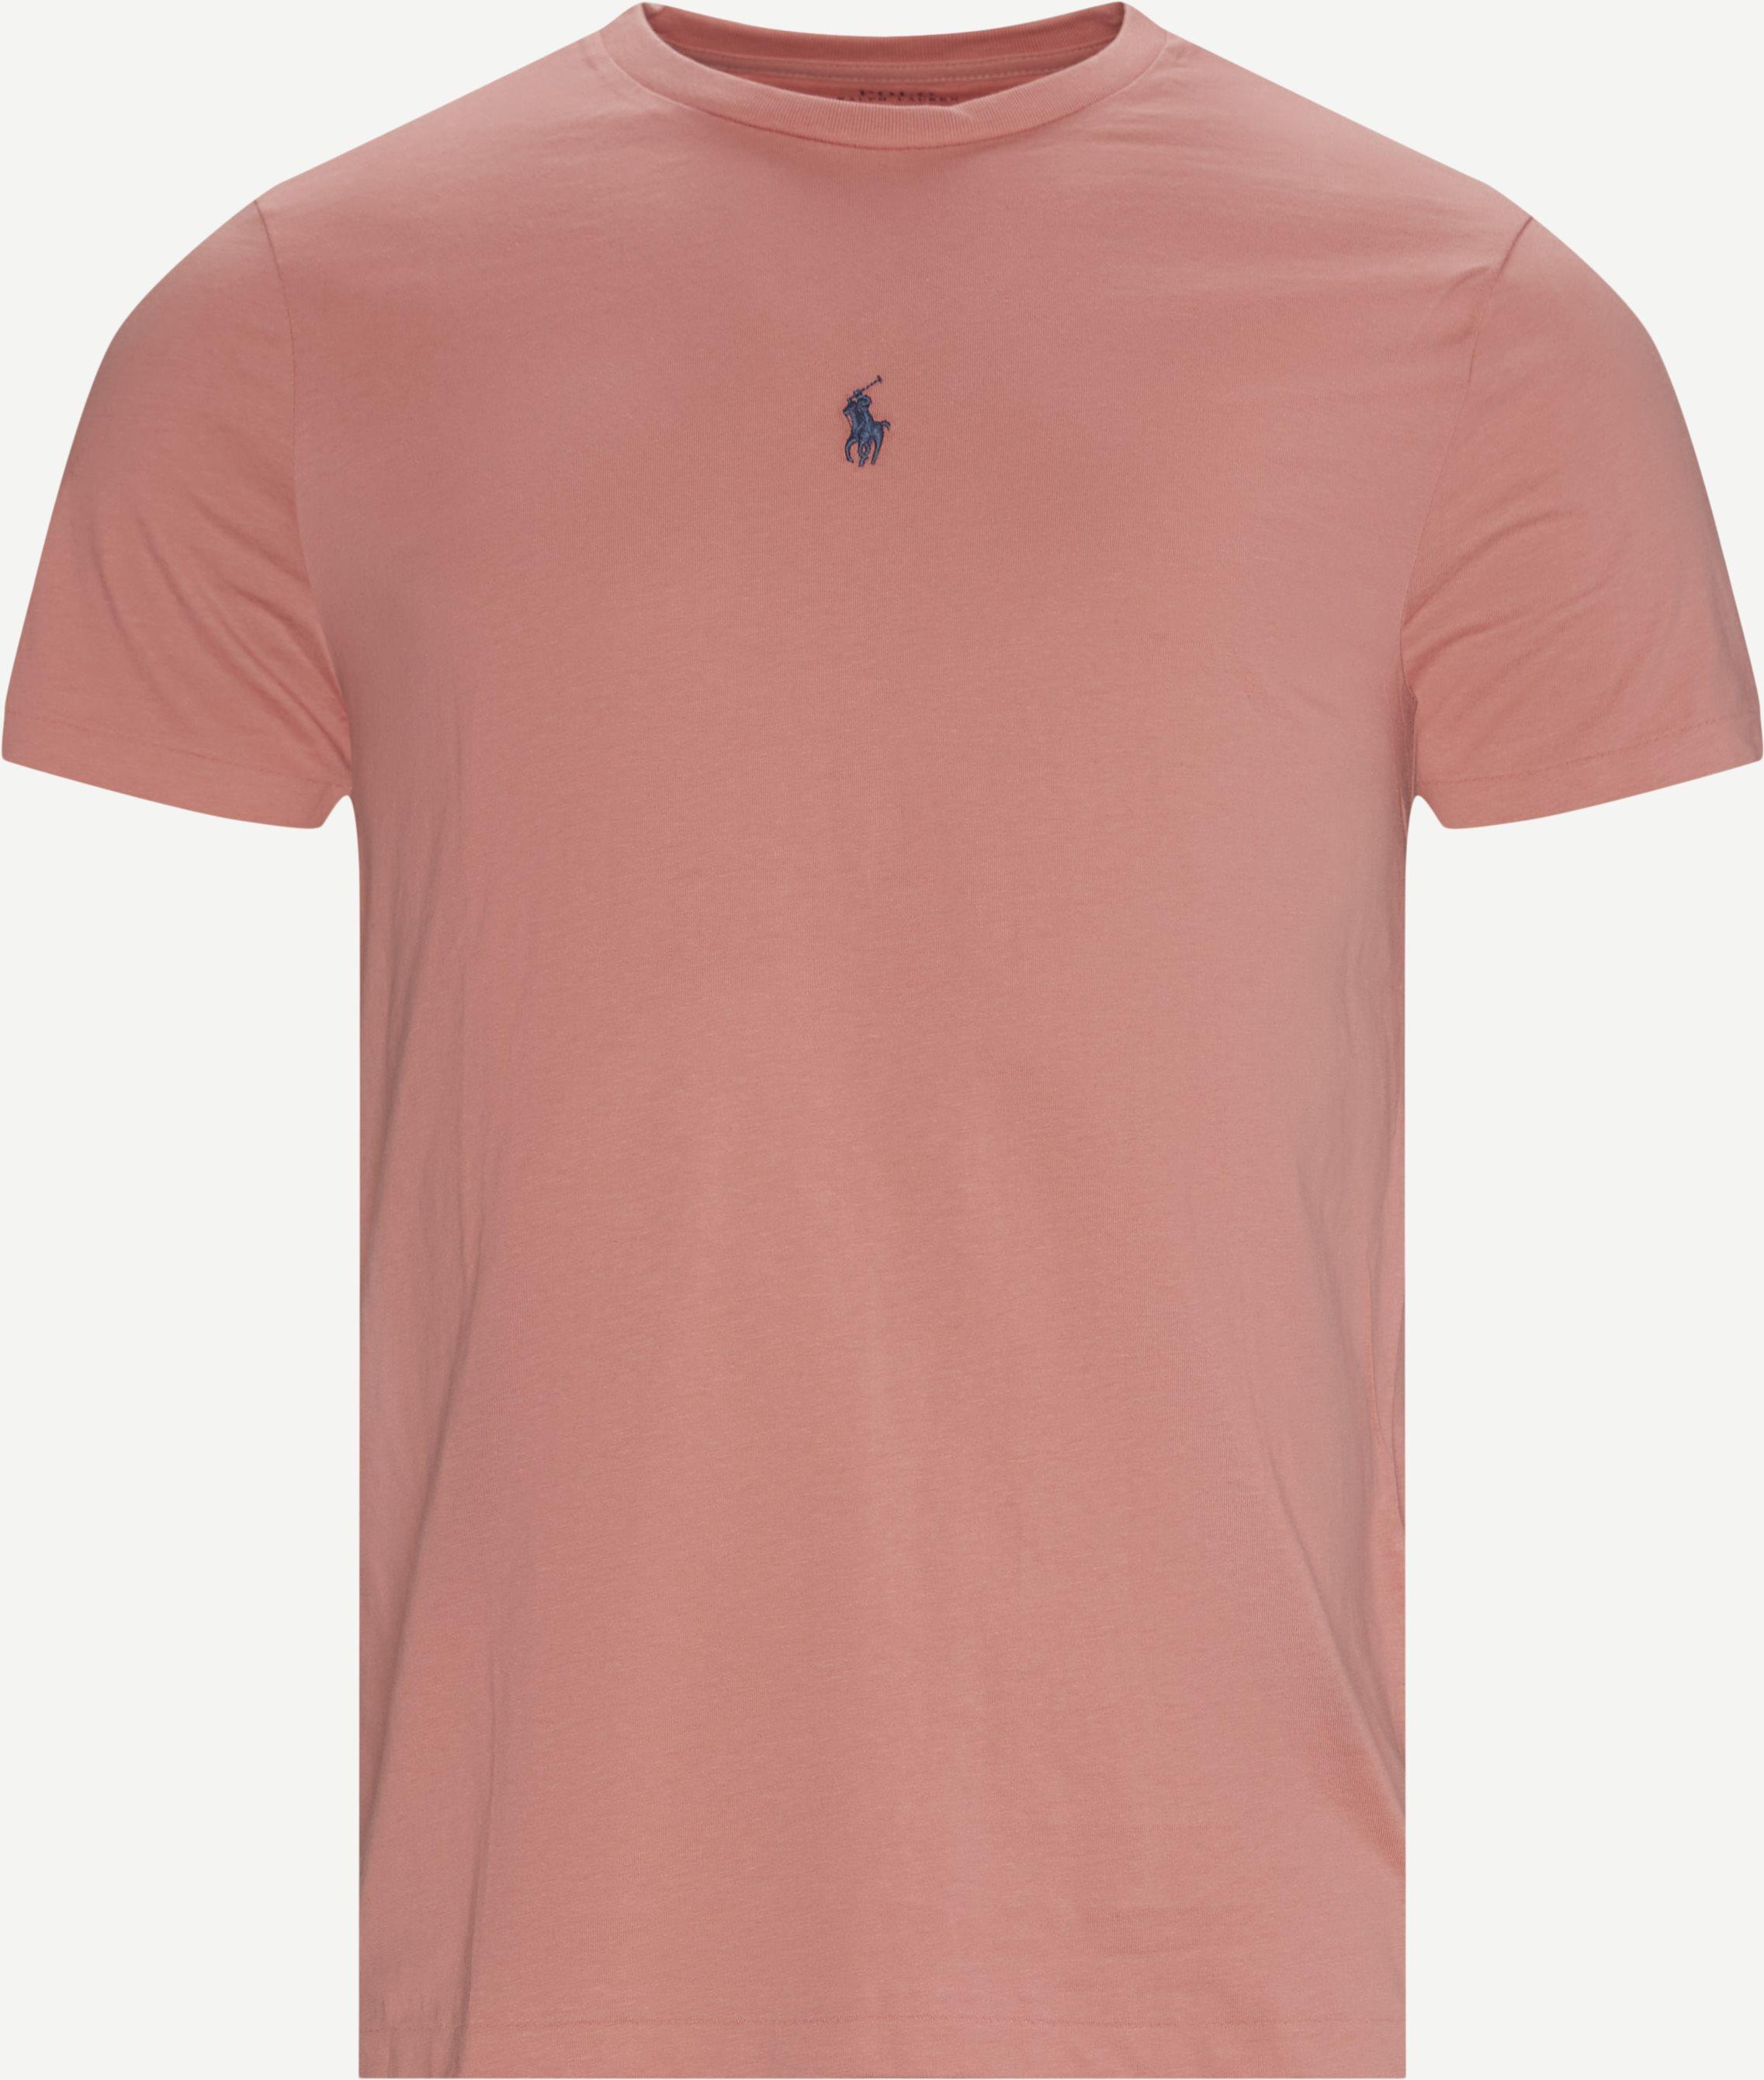 Logo T-shirt - T-shirts - Slim fit - Pink